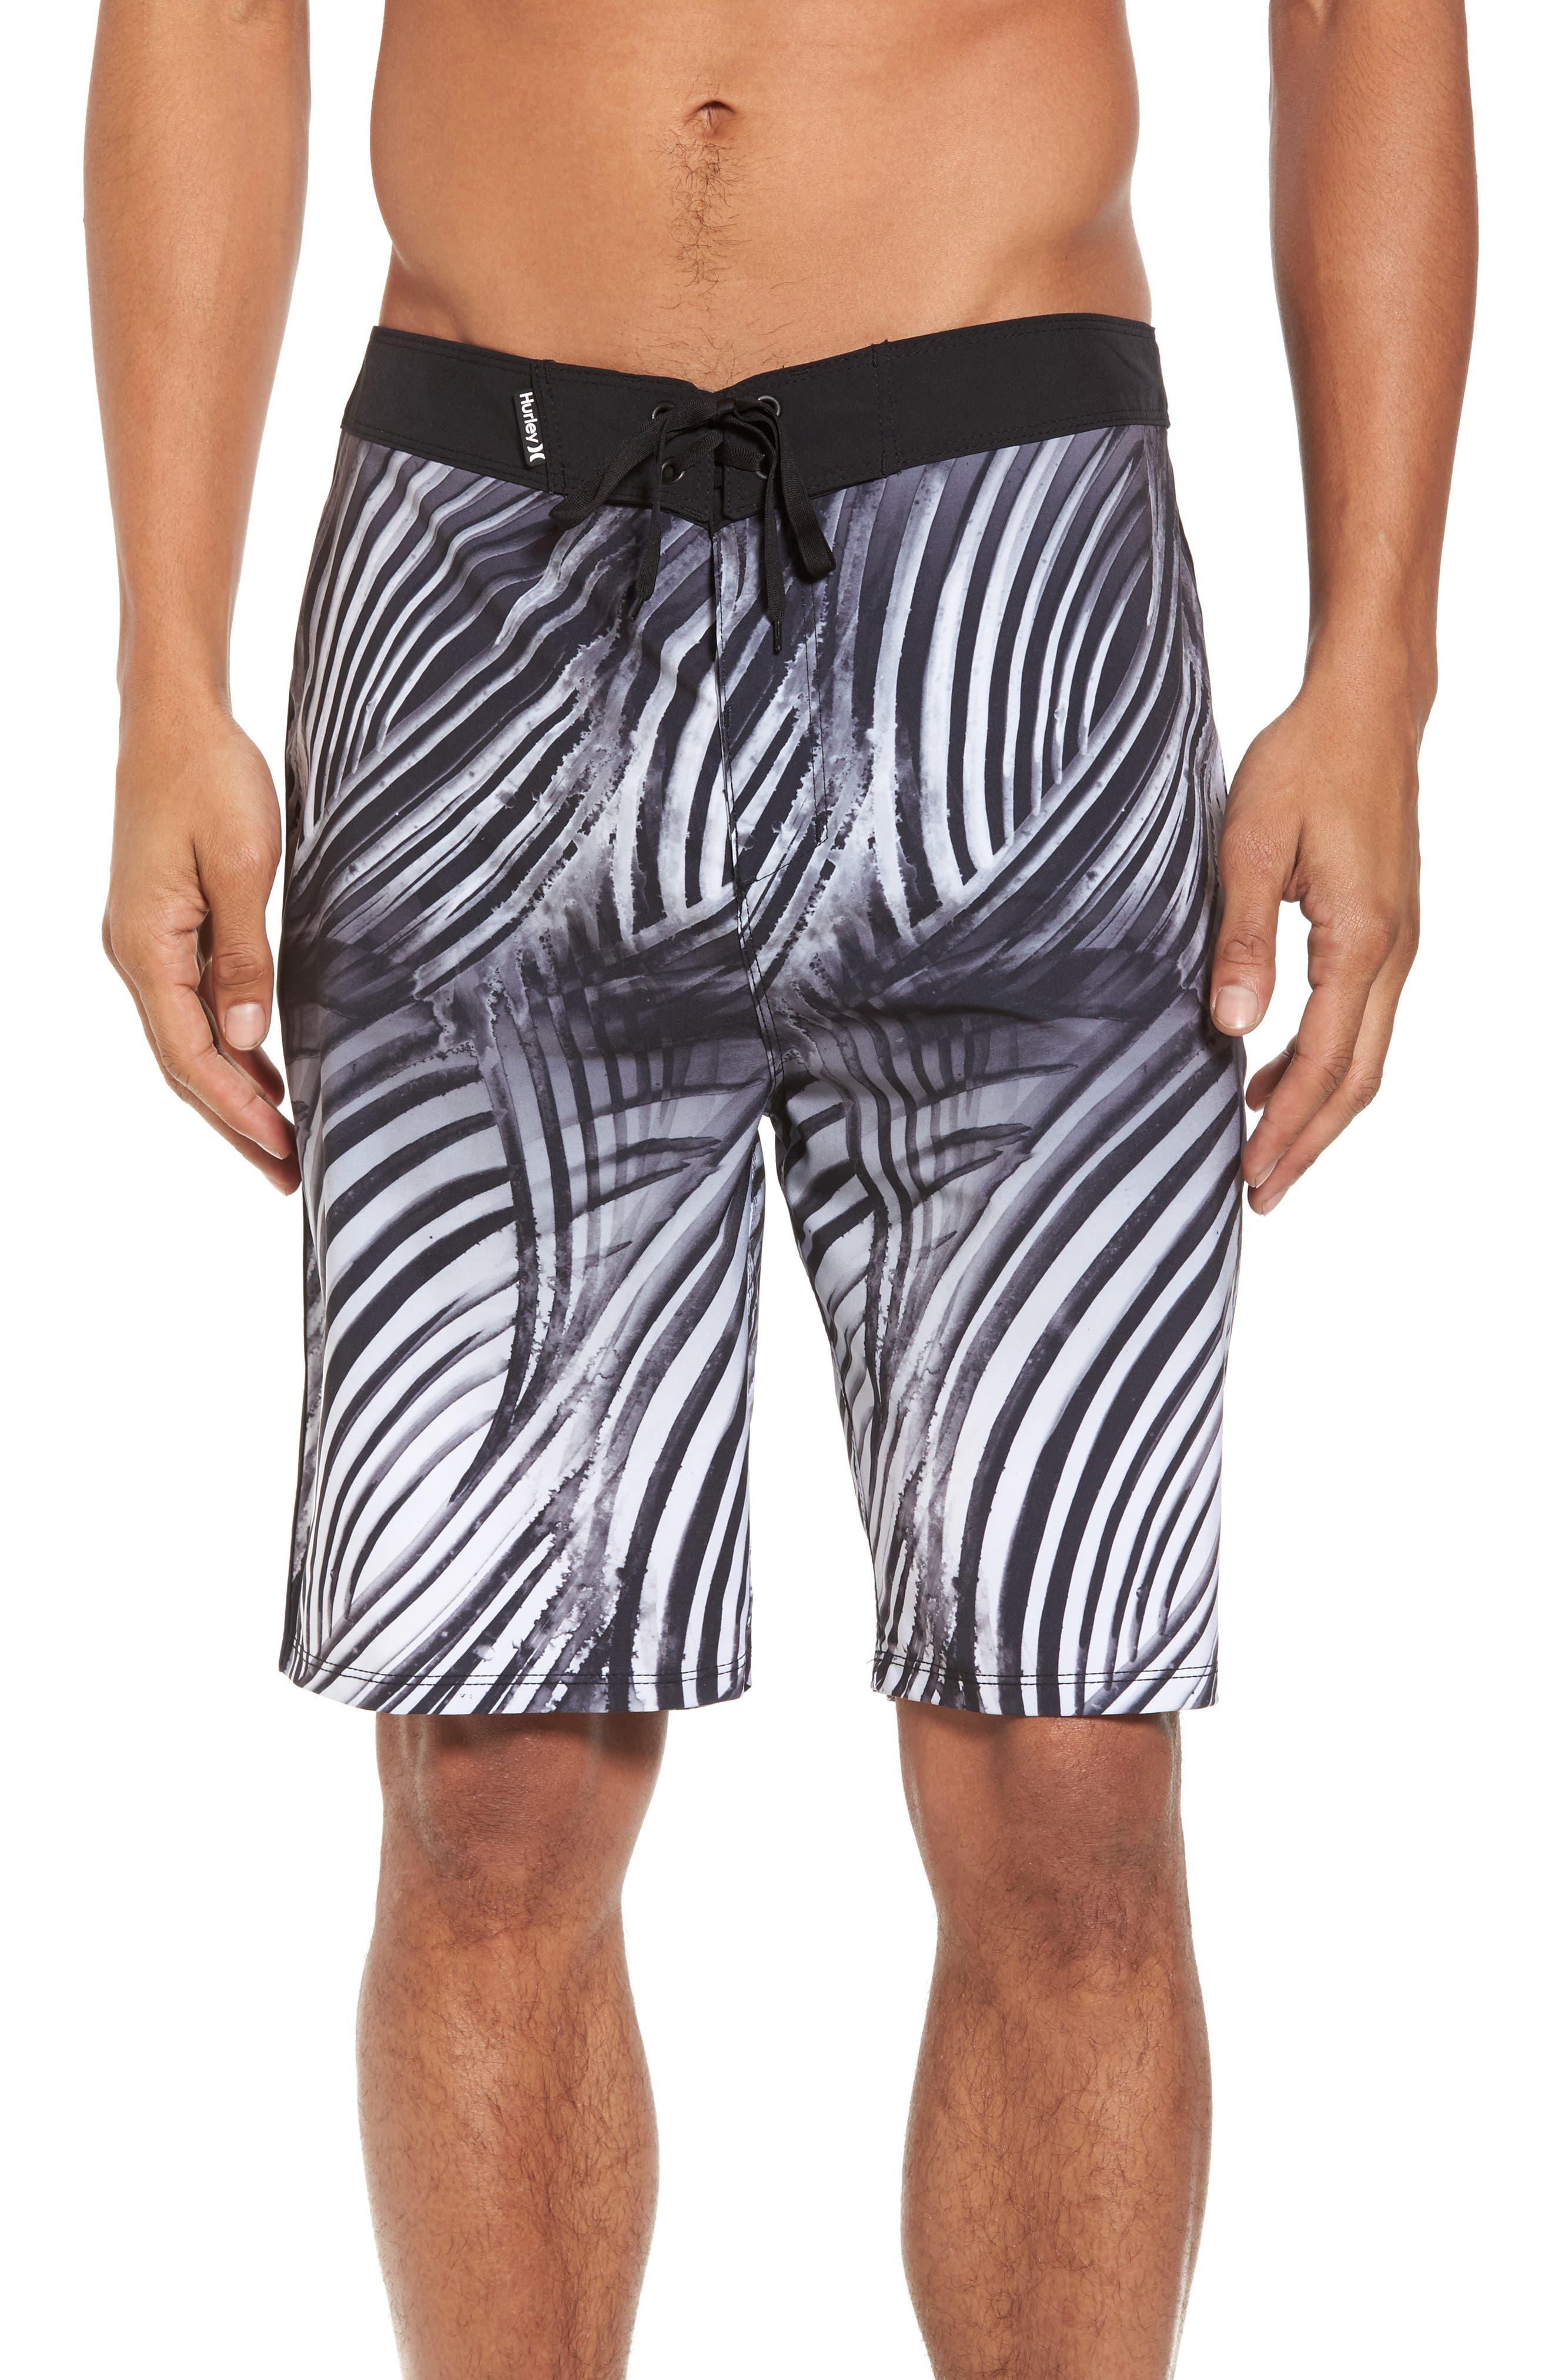 Phantom Crest Board Shorts,                         Main,                         color, Black